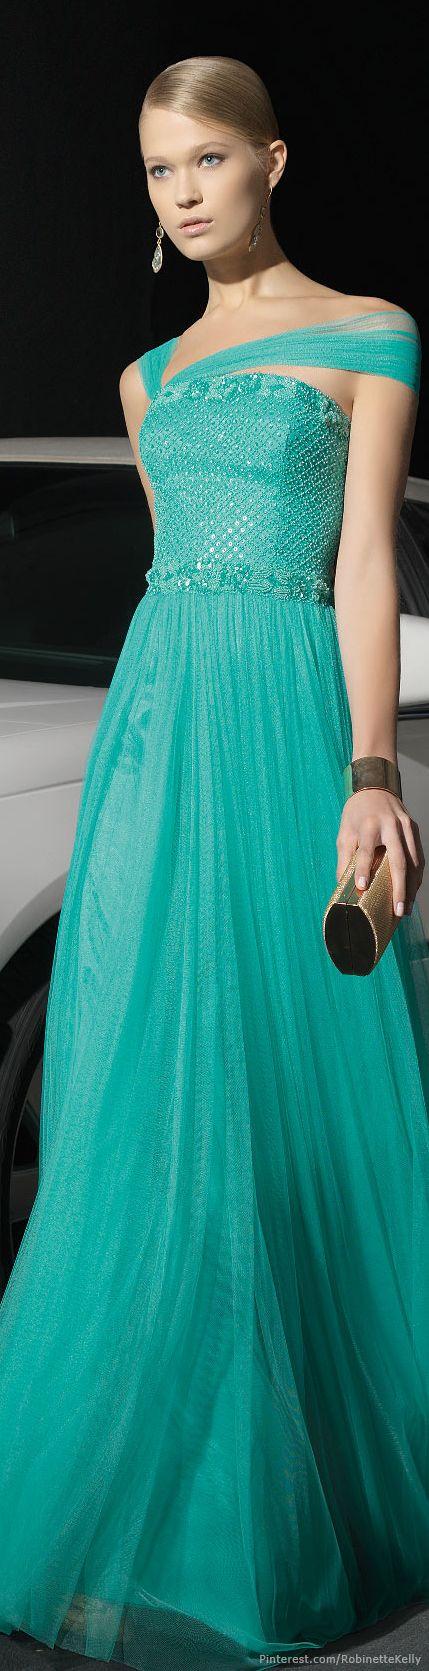 Rosa Clará 2014 #turquoise #fashion